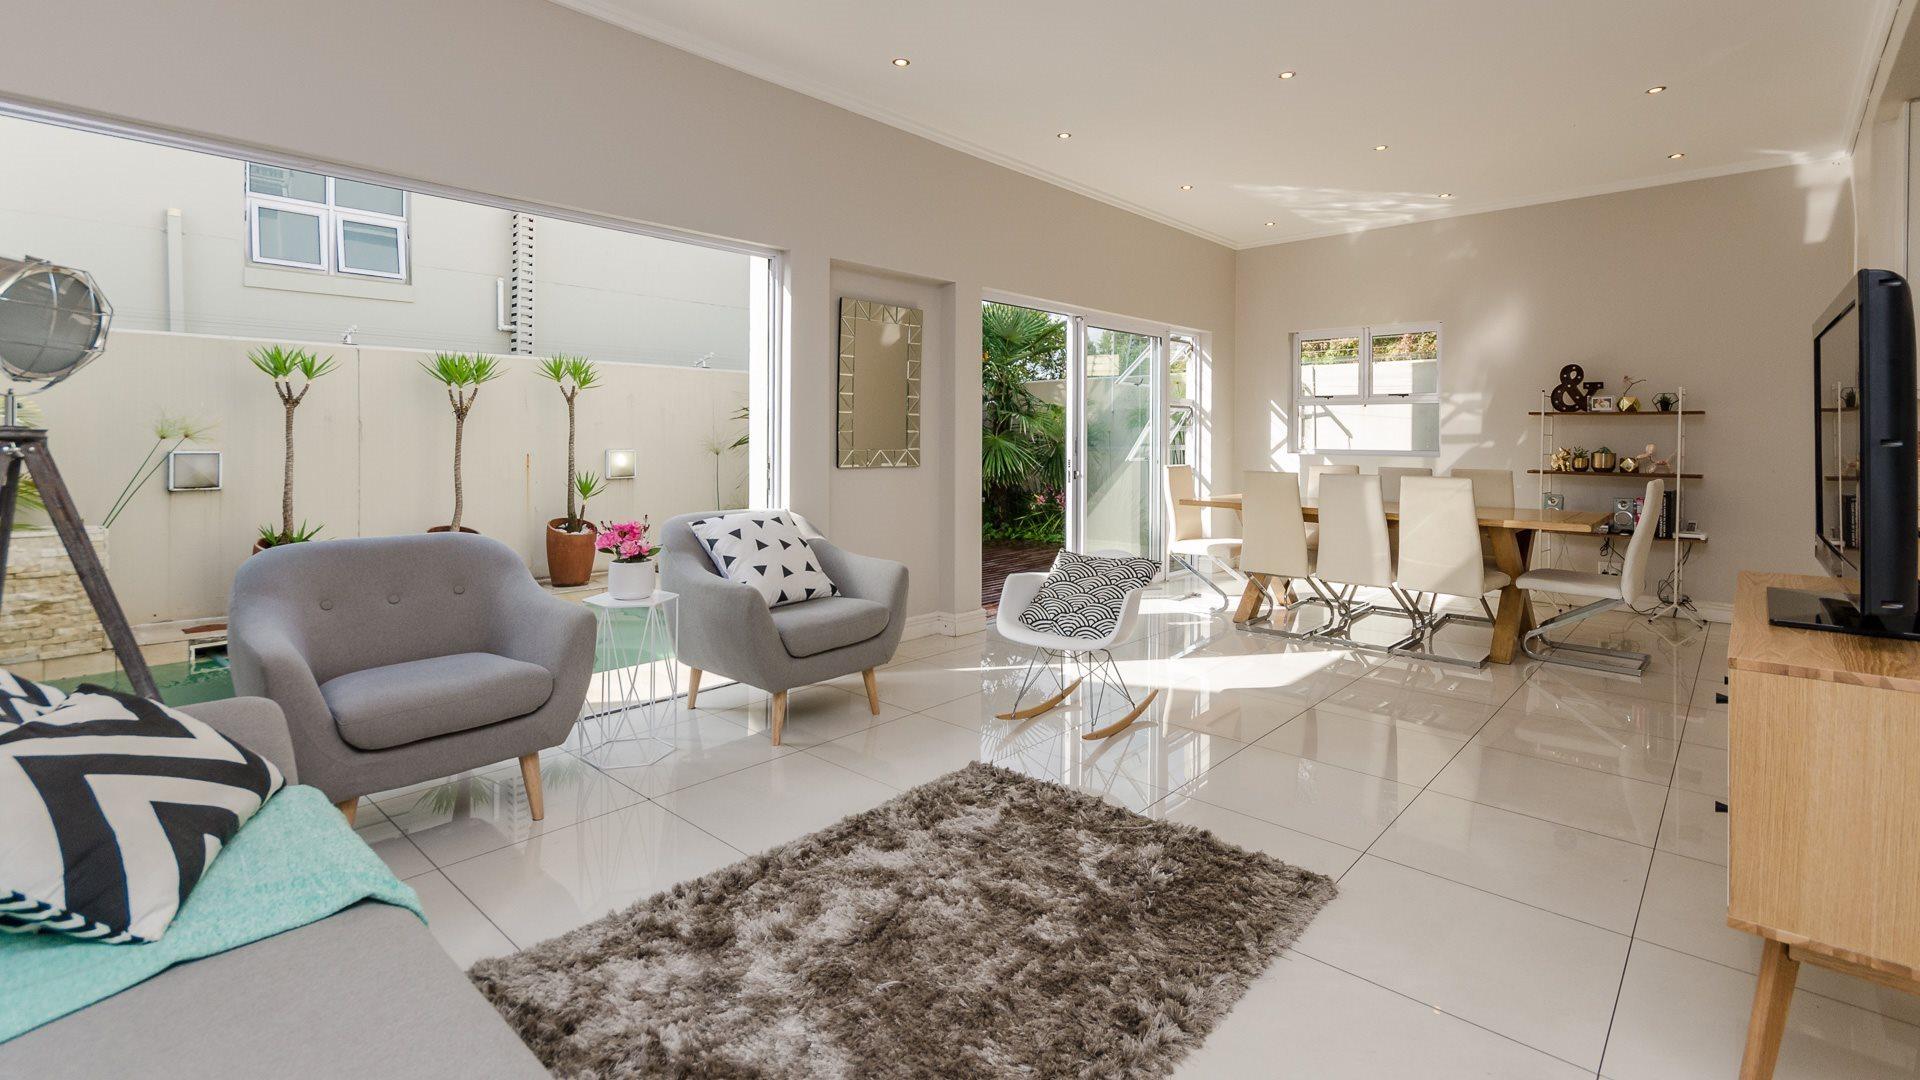 Johannesburg, Oaklands Property  | Houses For Sale Oaklands, Oaklands, Townhouse 3 bedrooms property for sale Price:3,500,000